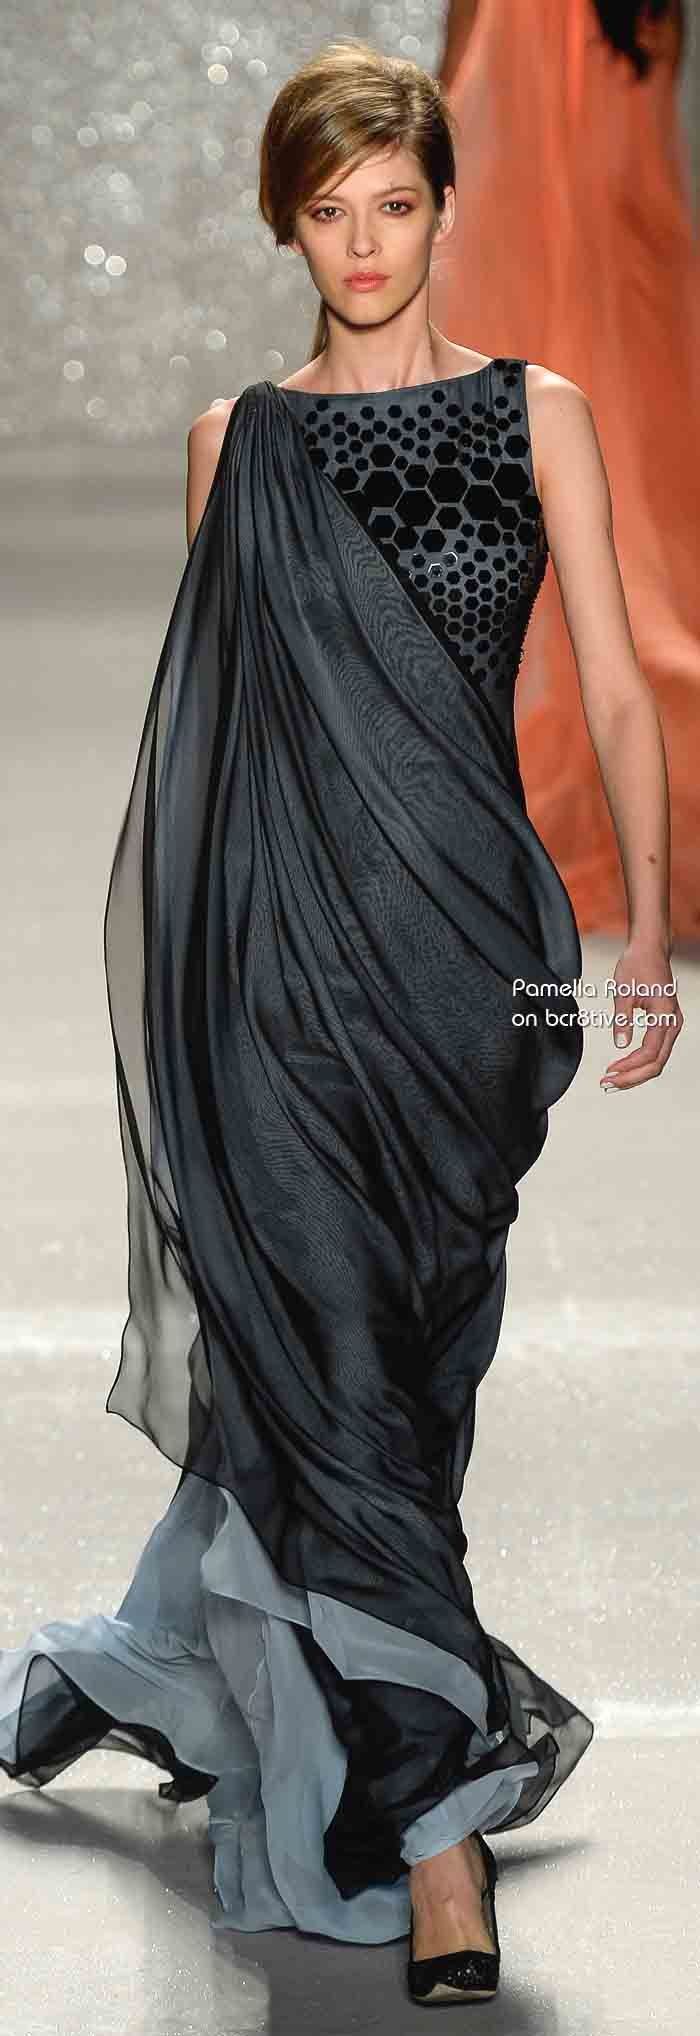 Pamella Roland Spring 2014 New York Fashion Week - bcr8tive